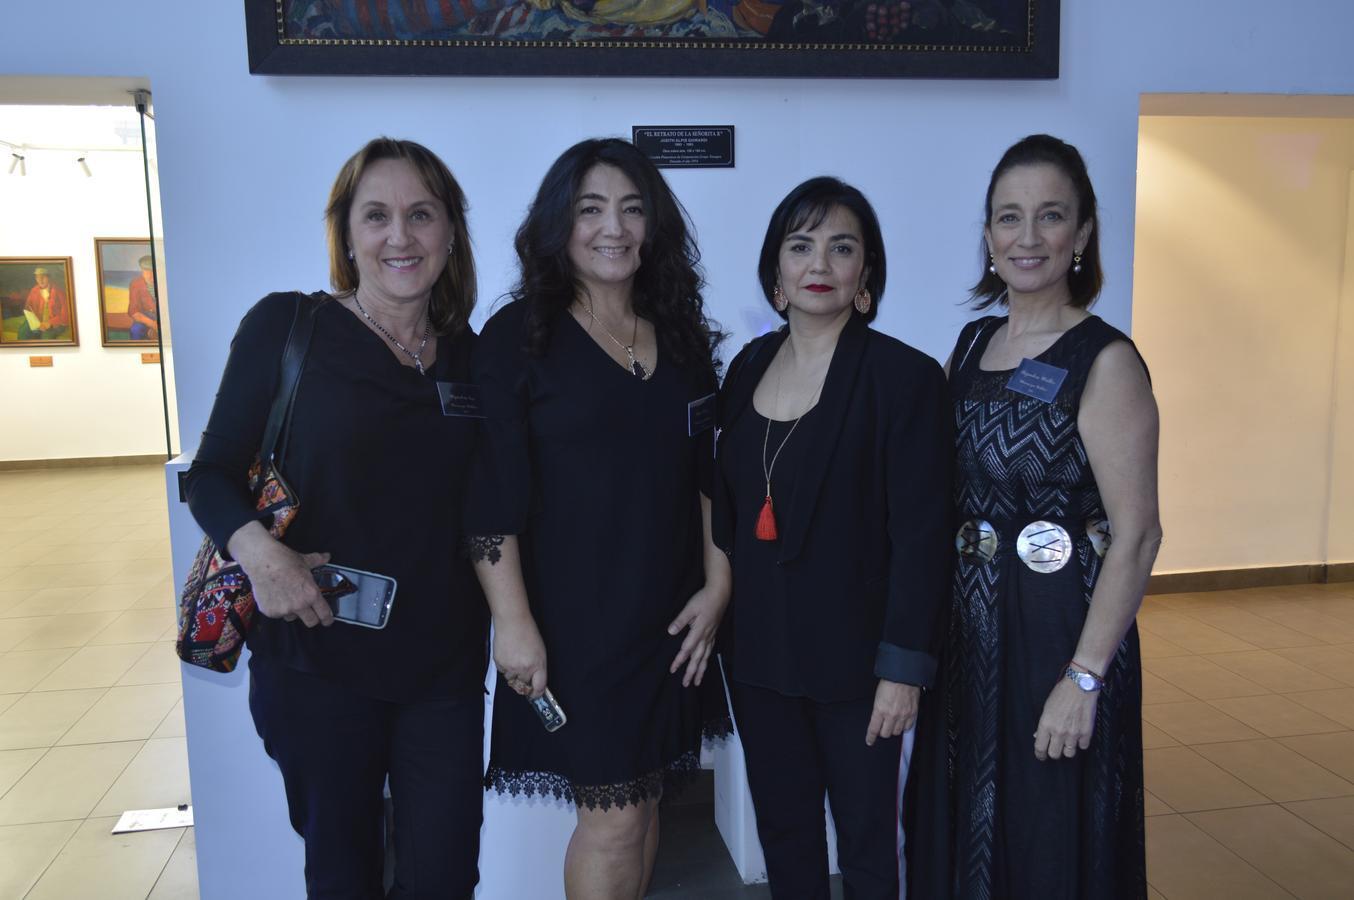 Alejandra Cox, Pilar Flores, Ema Vera y Alejandra Müller